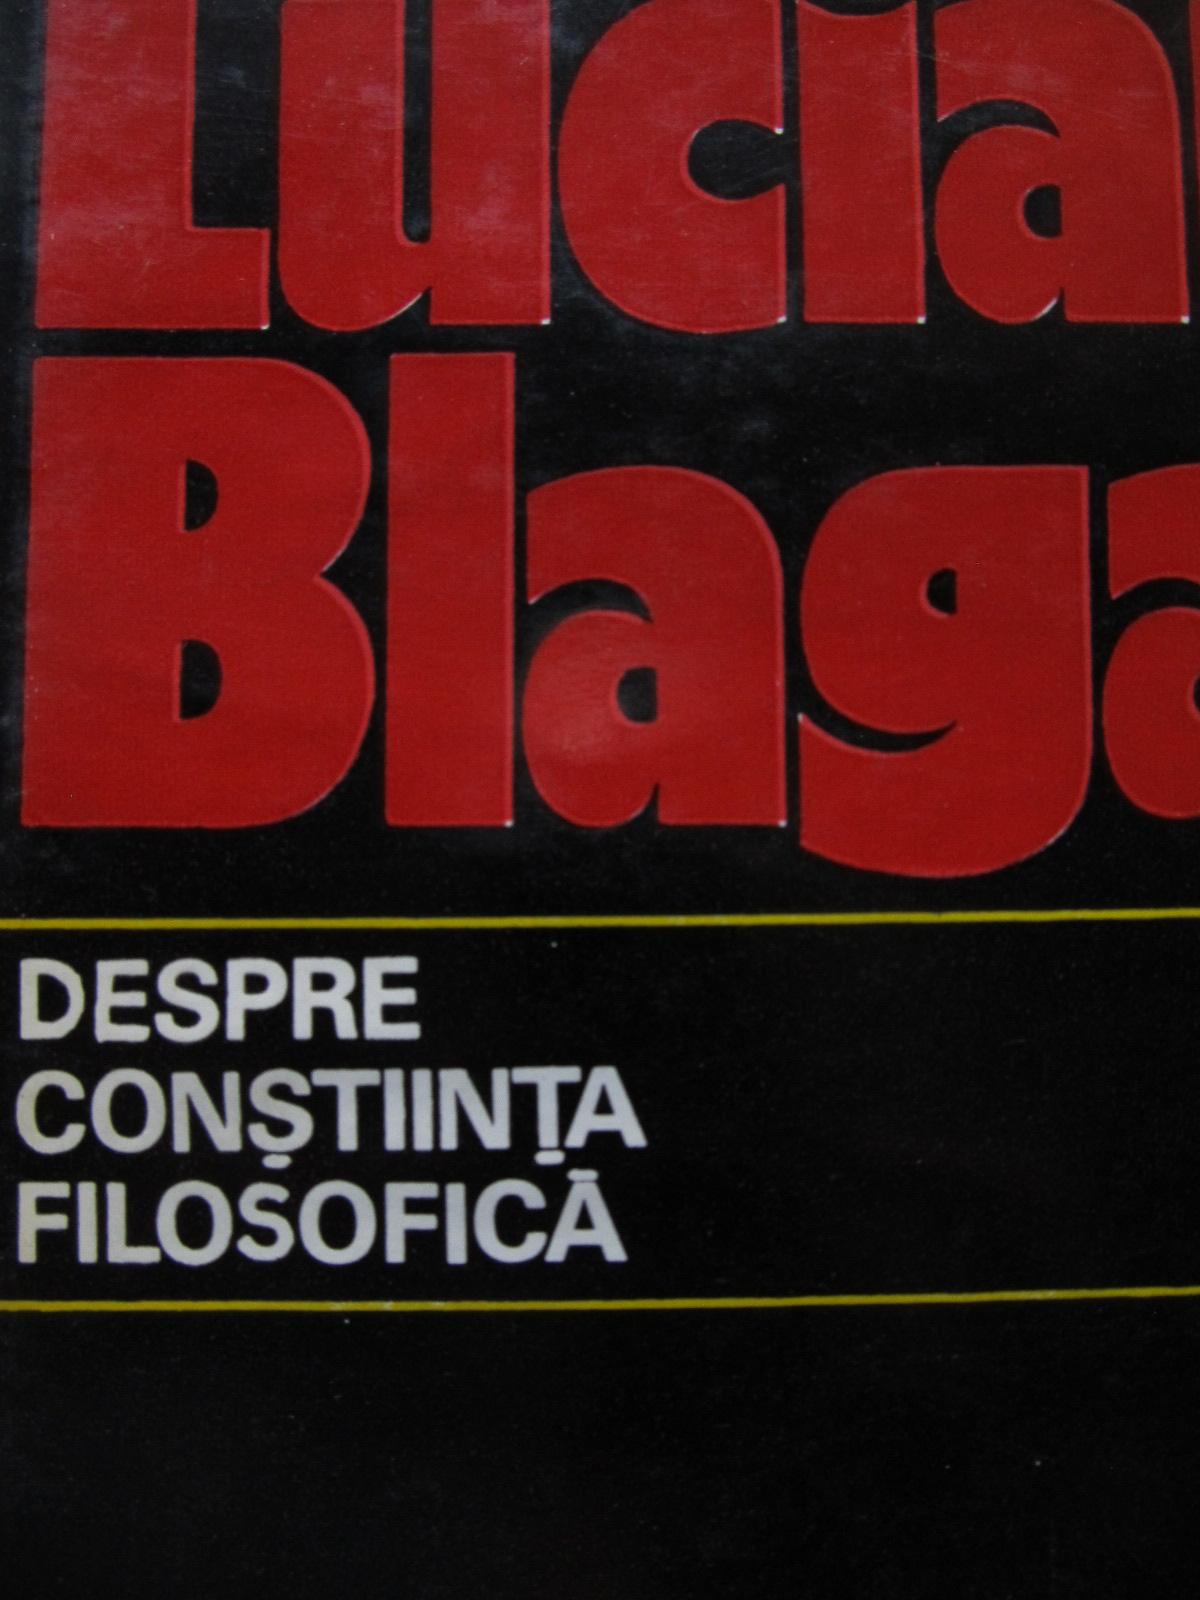 Despre constiinta filosofica - Lucian Blaga | Detalii carte